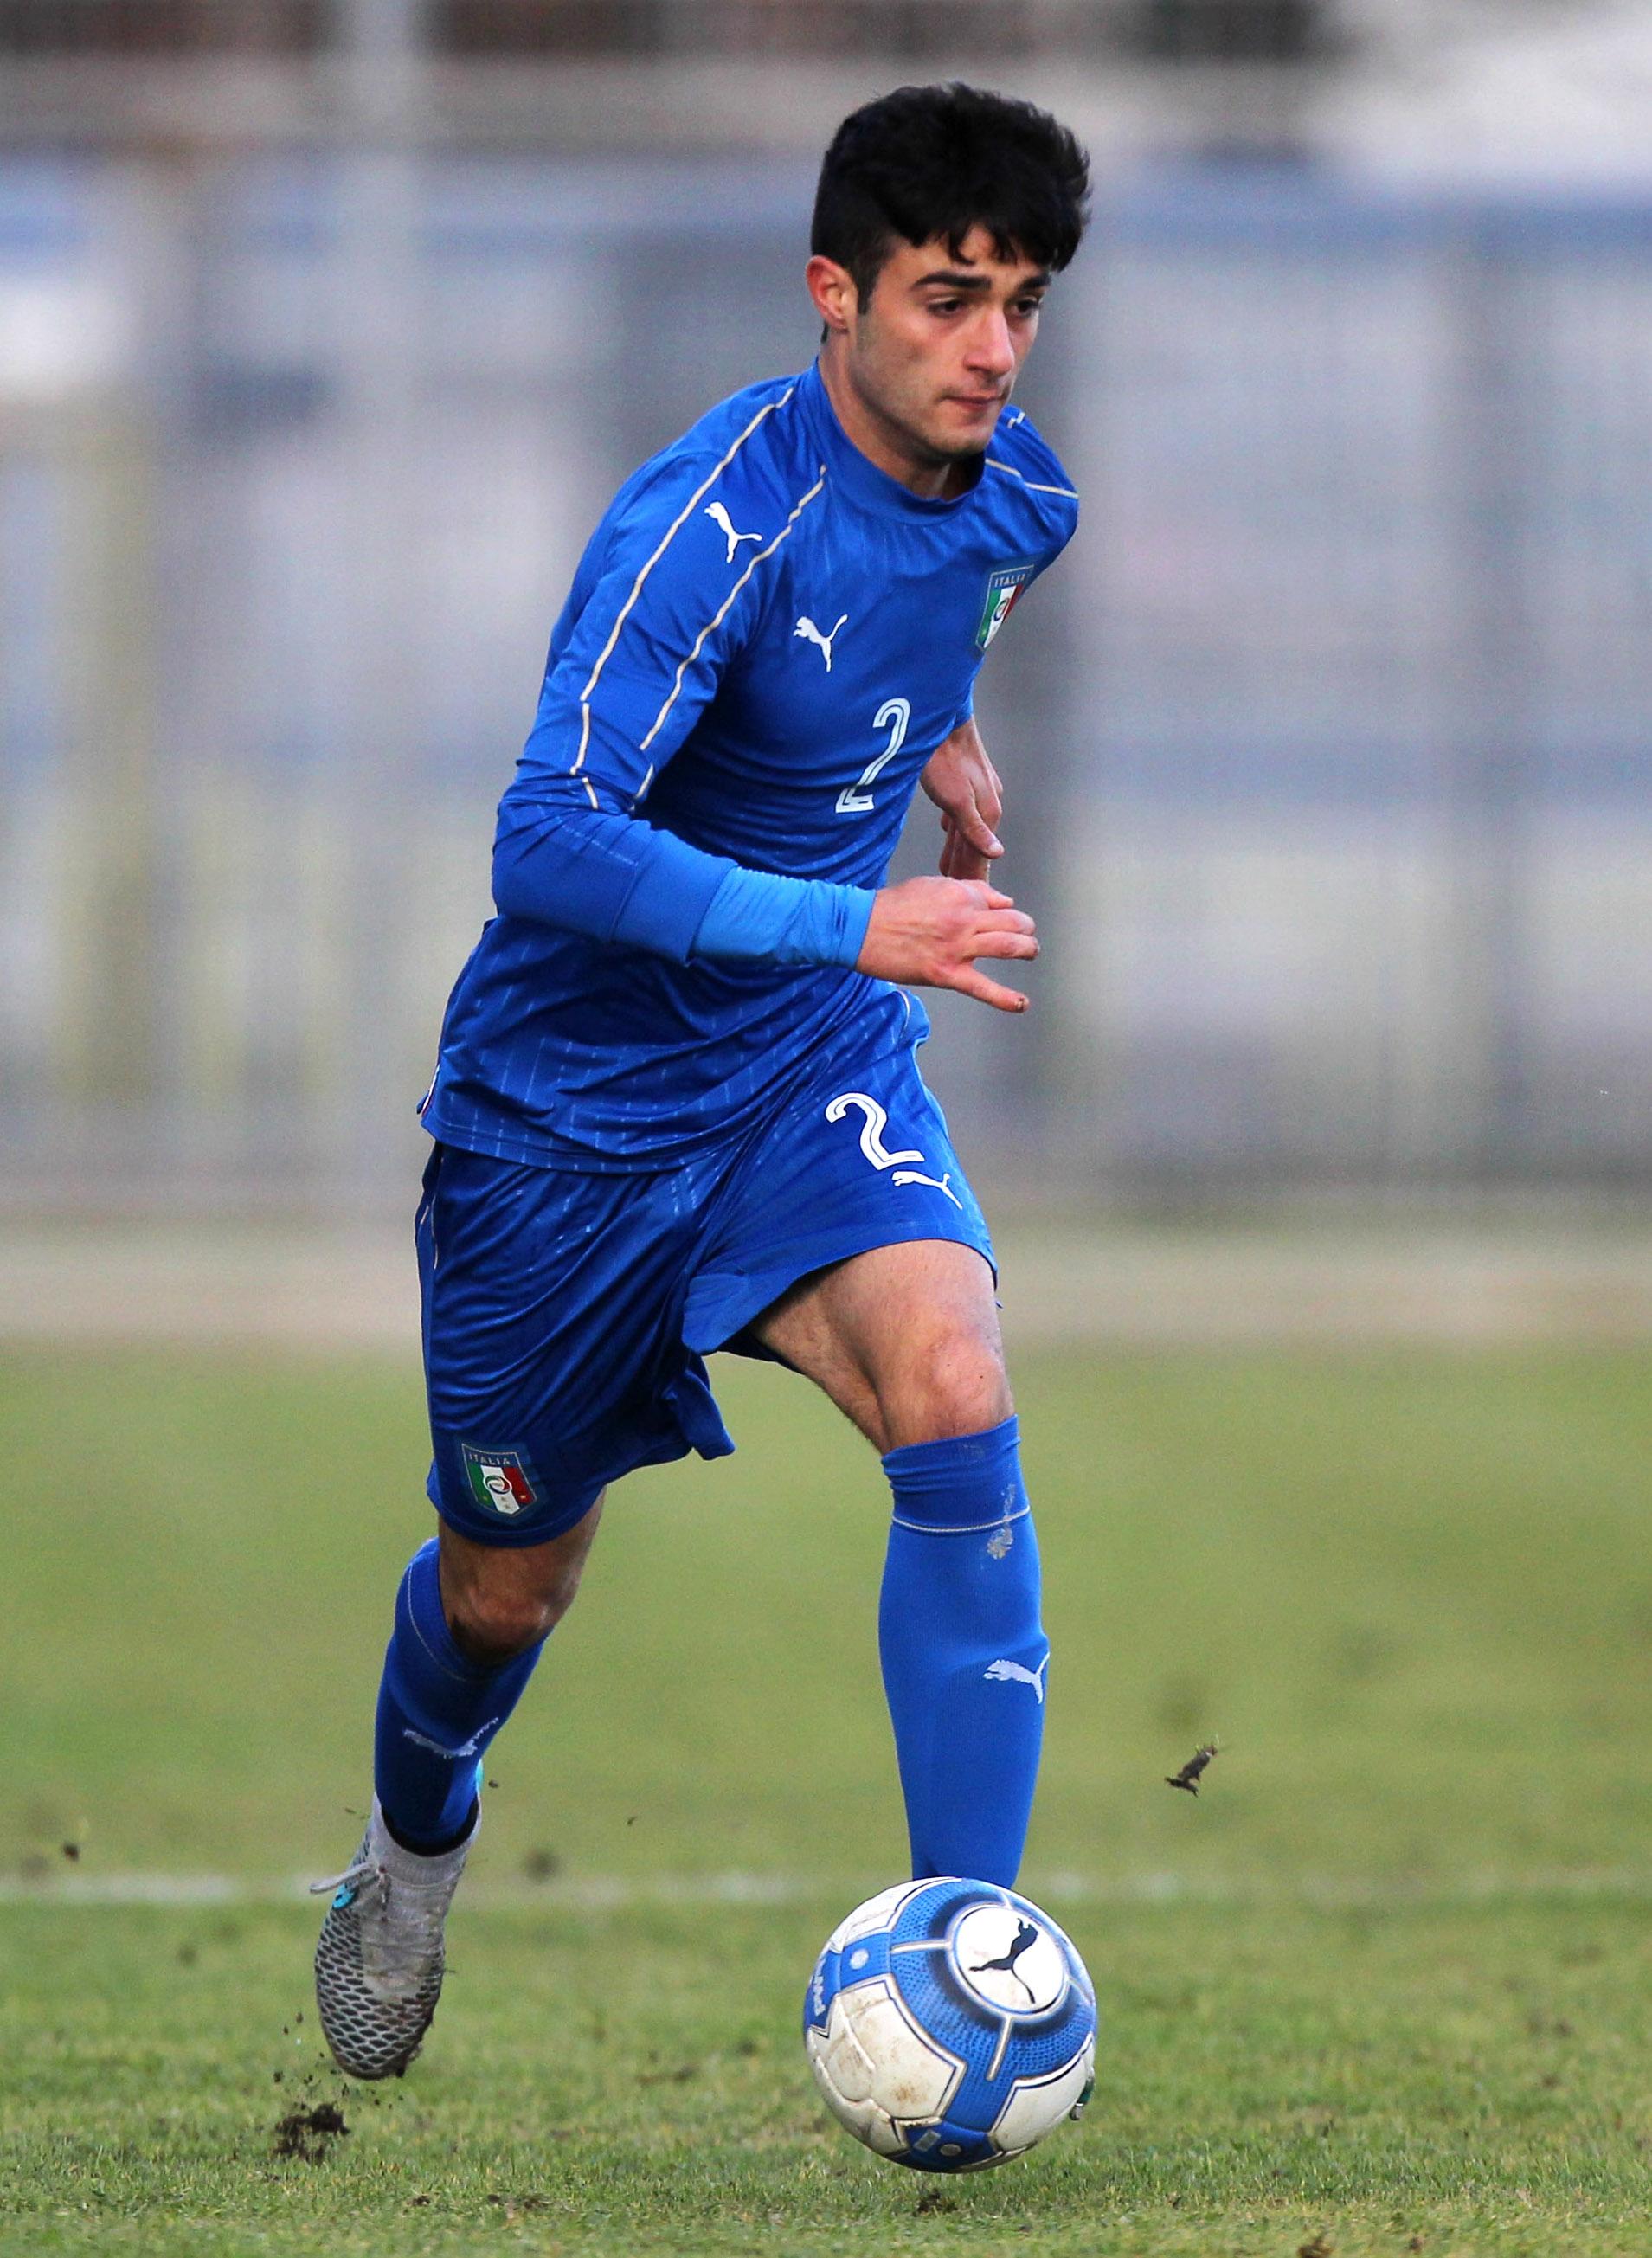 Italy U18 v Romania U18 - International Friendly